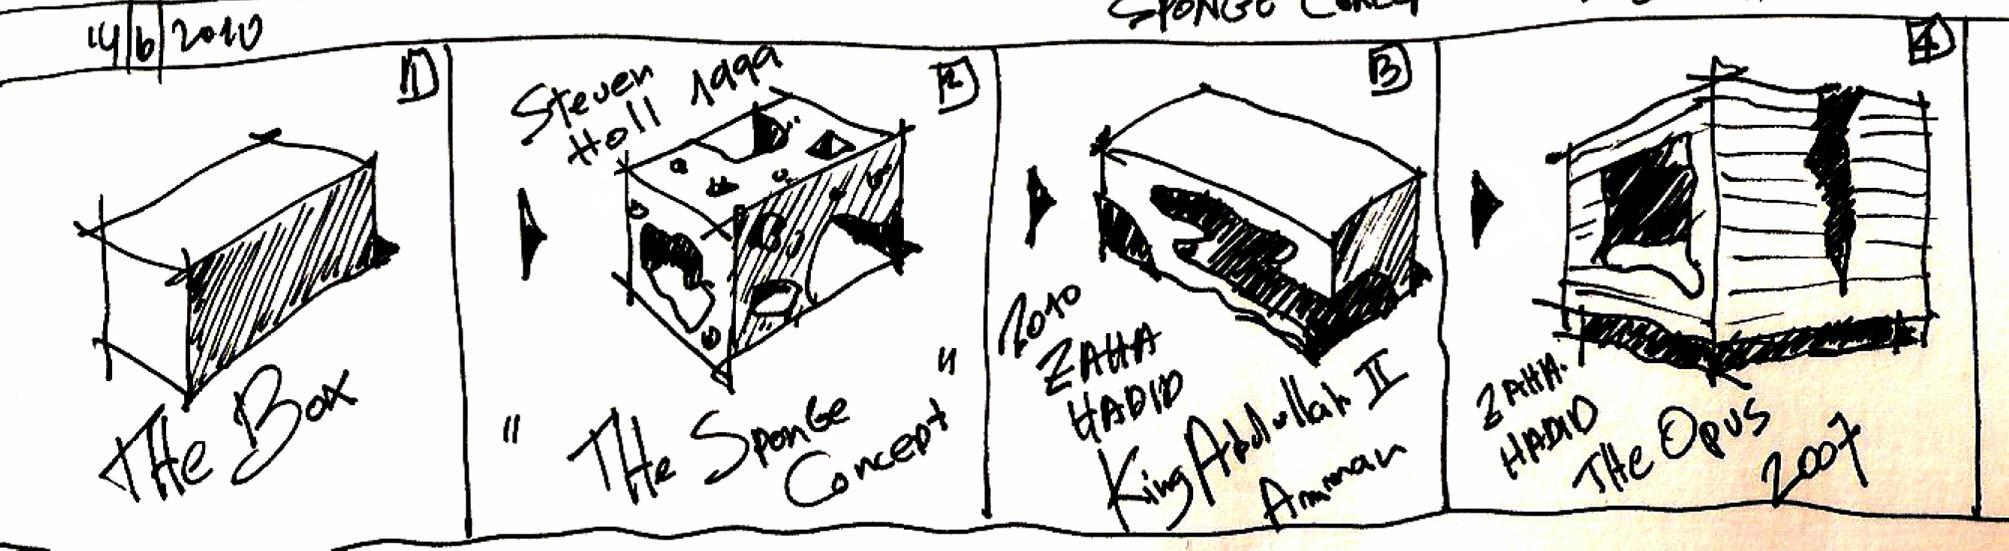 zaha-hadid-architect-_-opus-office-building-_-20070001